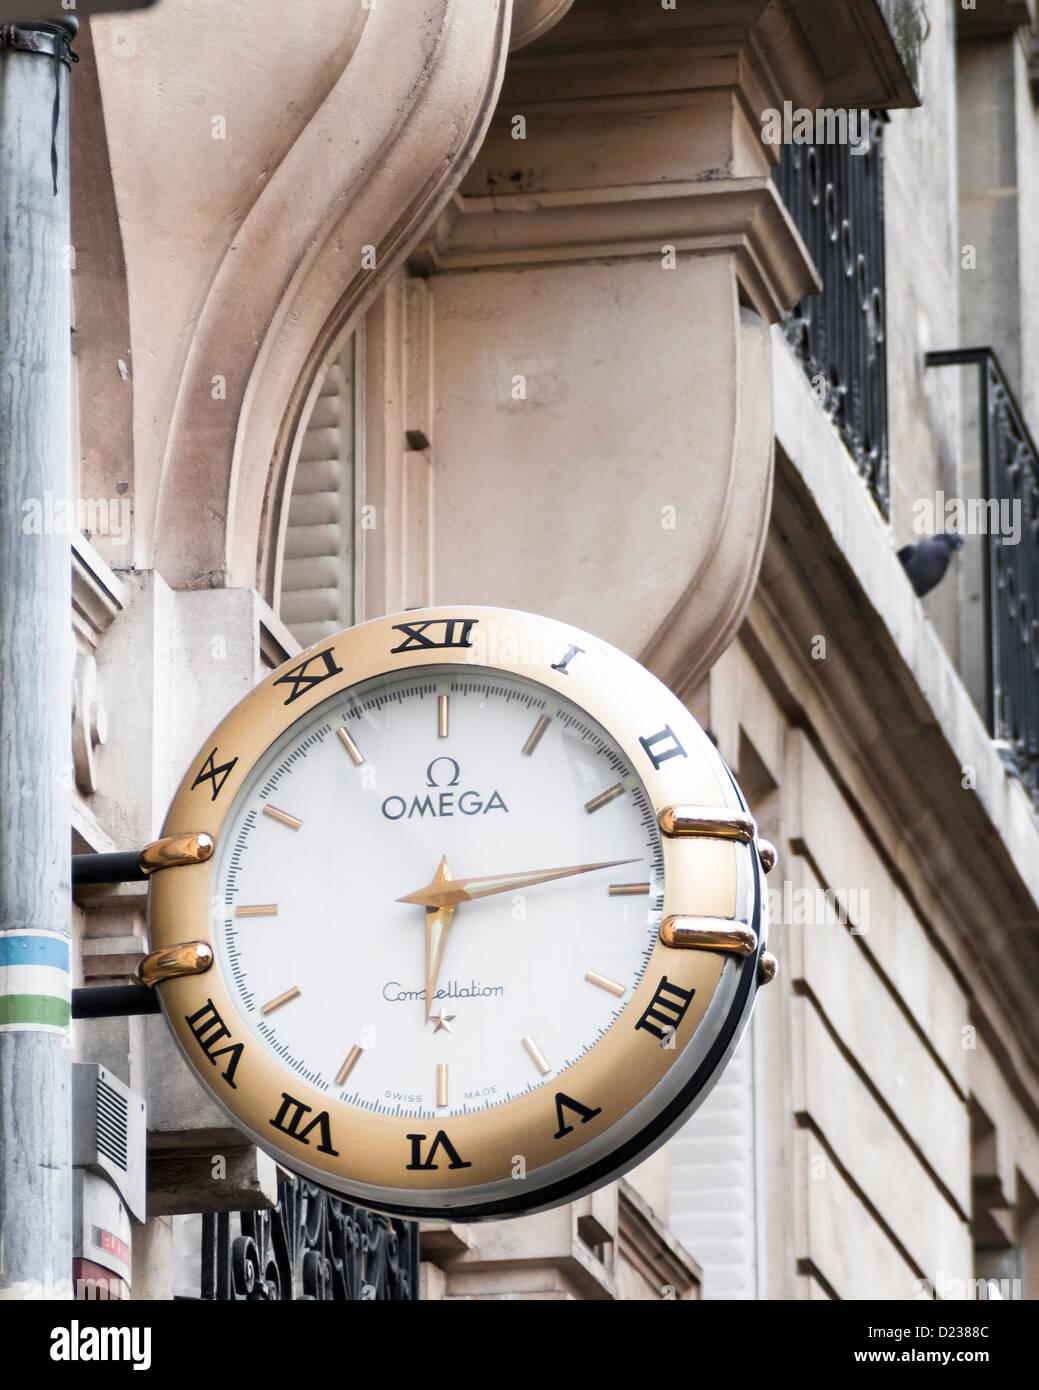 Paris France Europe Large Omega watch clock timepiece shop sign logo - Stock Image